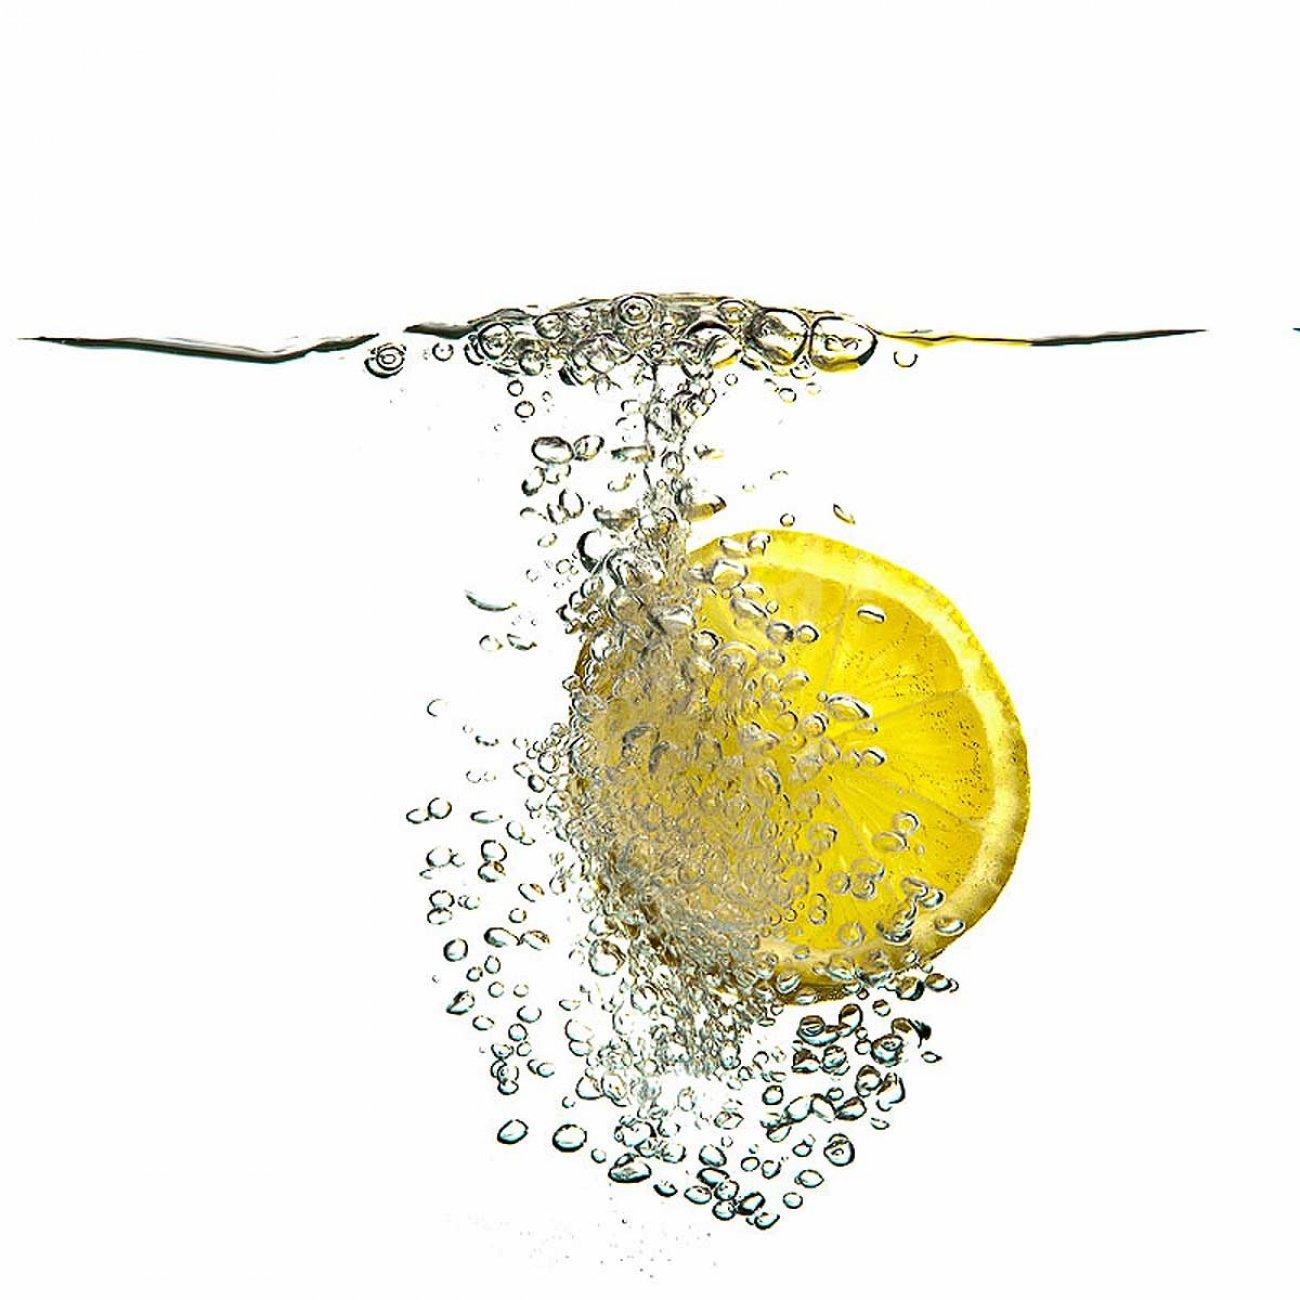 Limone 50 - Beutel 2 kg - Speiseeispulver